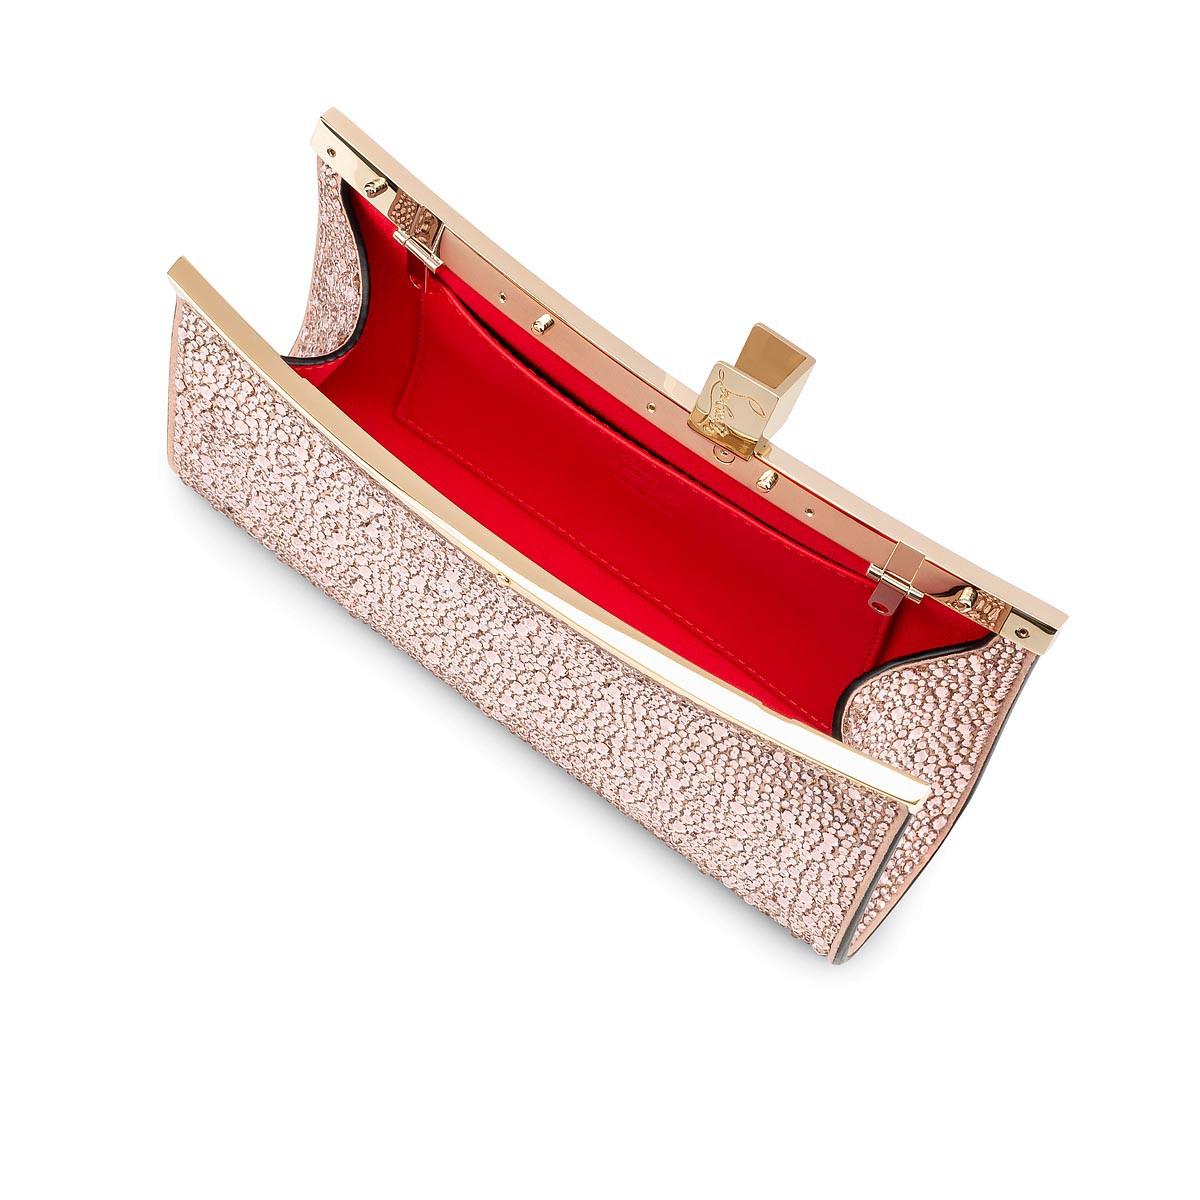 Bags - Palmette Clutch Small - Christian Louboutin